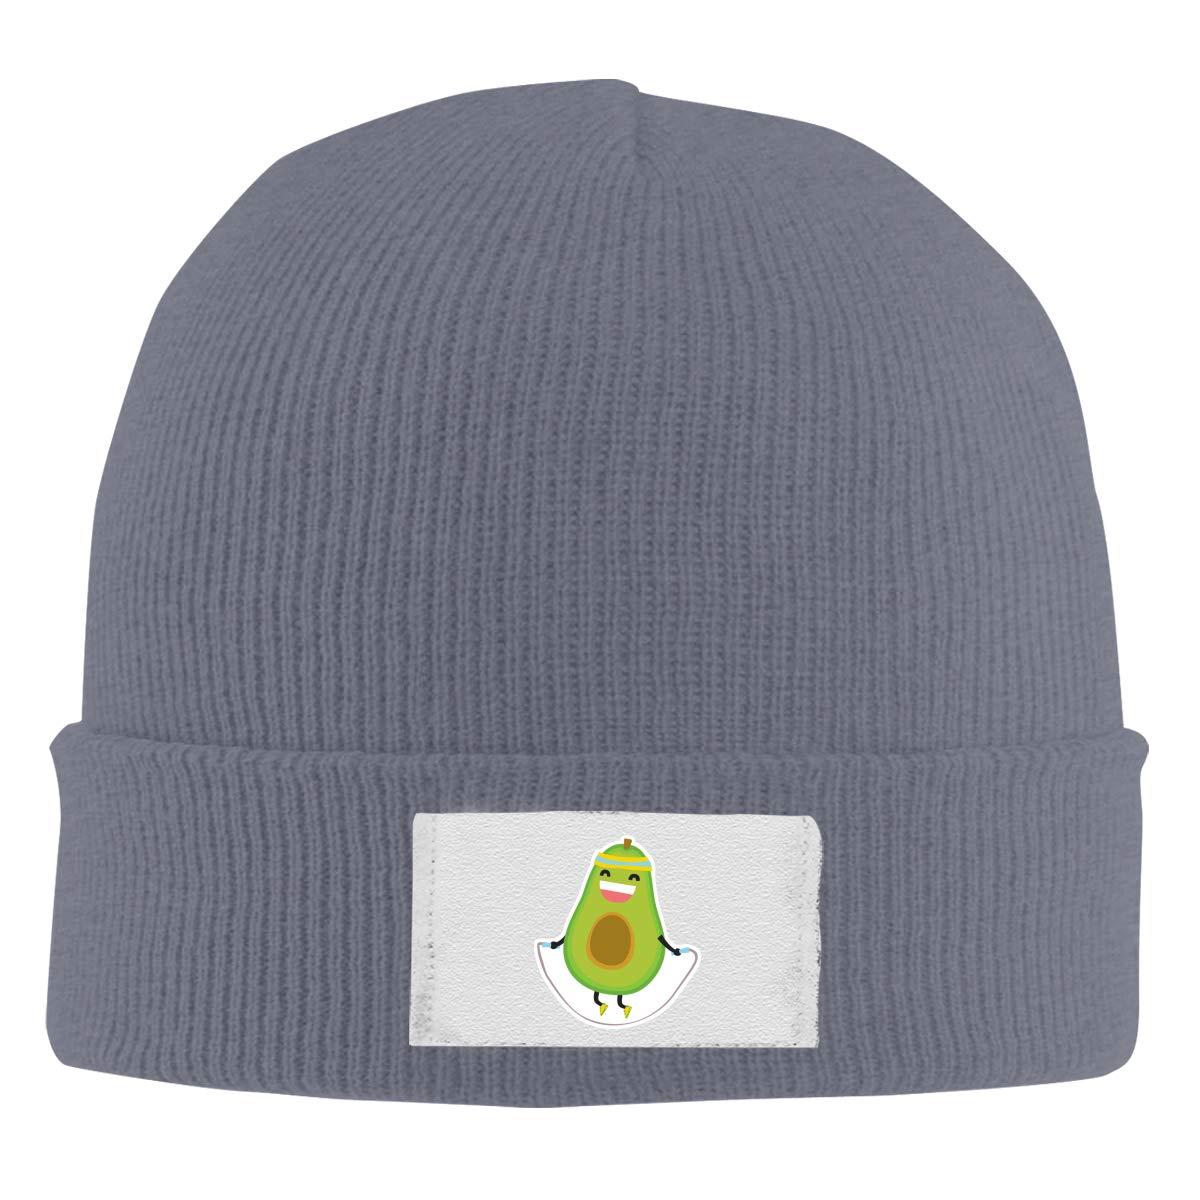 Dunpaiaa Skull Caps Avocado Jumping Rope Winter Warm Knit Hats Stretchy Cuff Beanie Hat Black